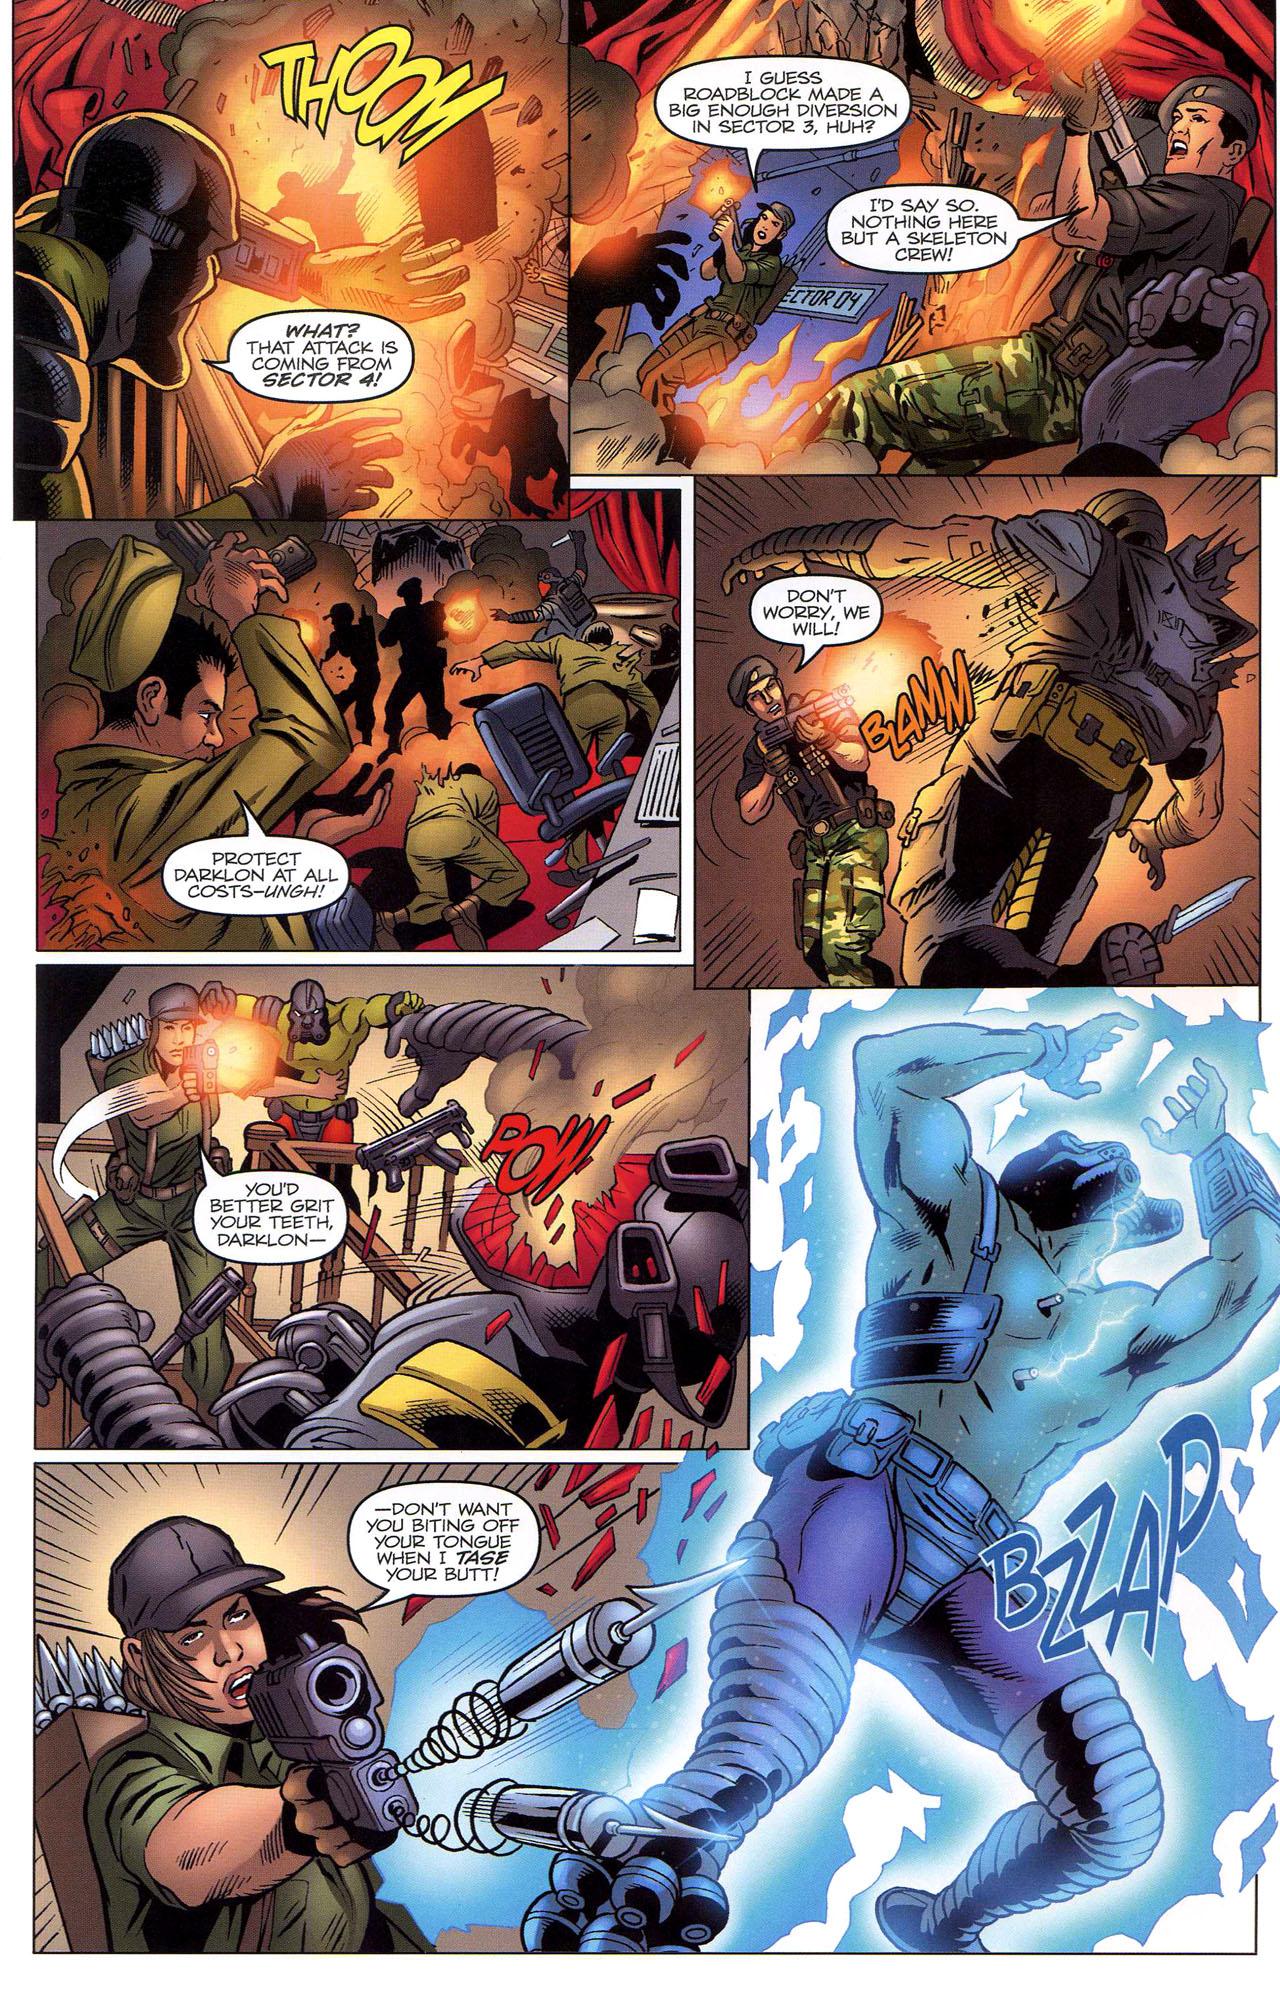 G.I. Joe: A Real American Hero 171 Page 17